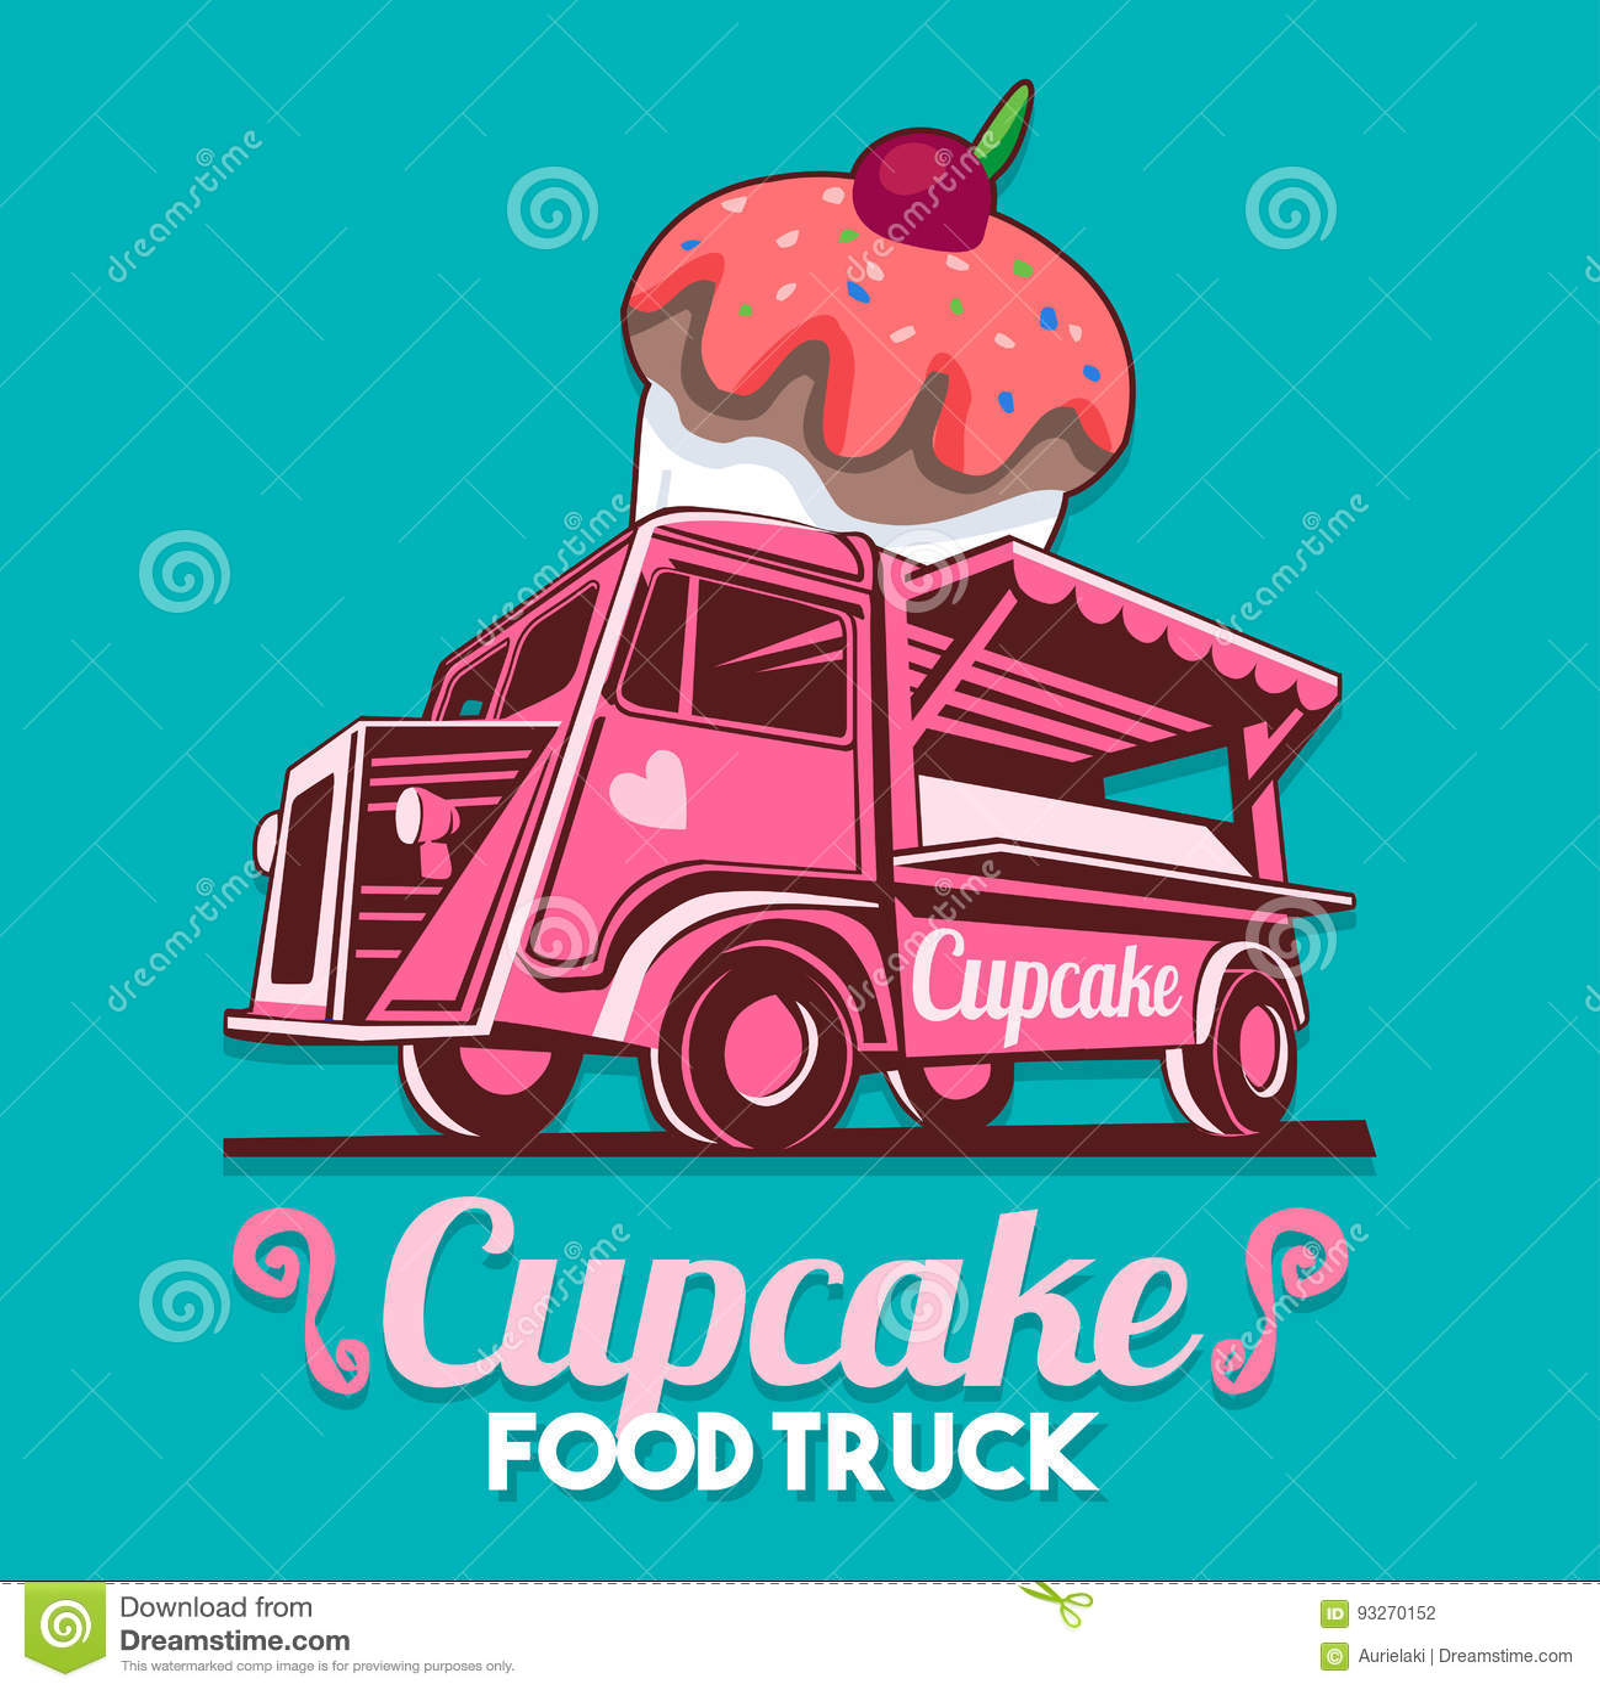 Food Truck Cake Stock Illustrations 382 Food Truck Cake Stock Illustrations Vectors Clipart Dreamstime